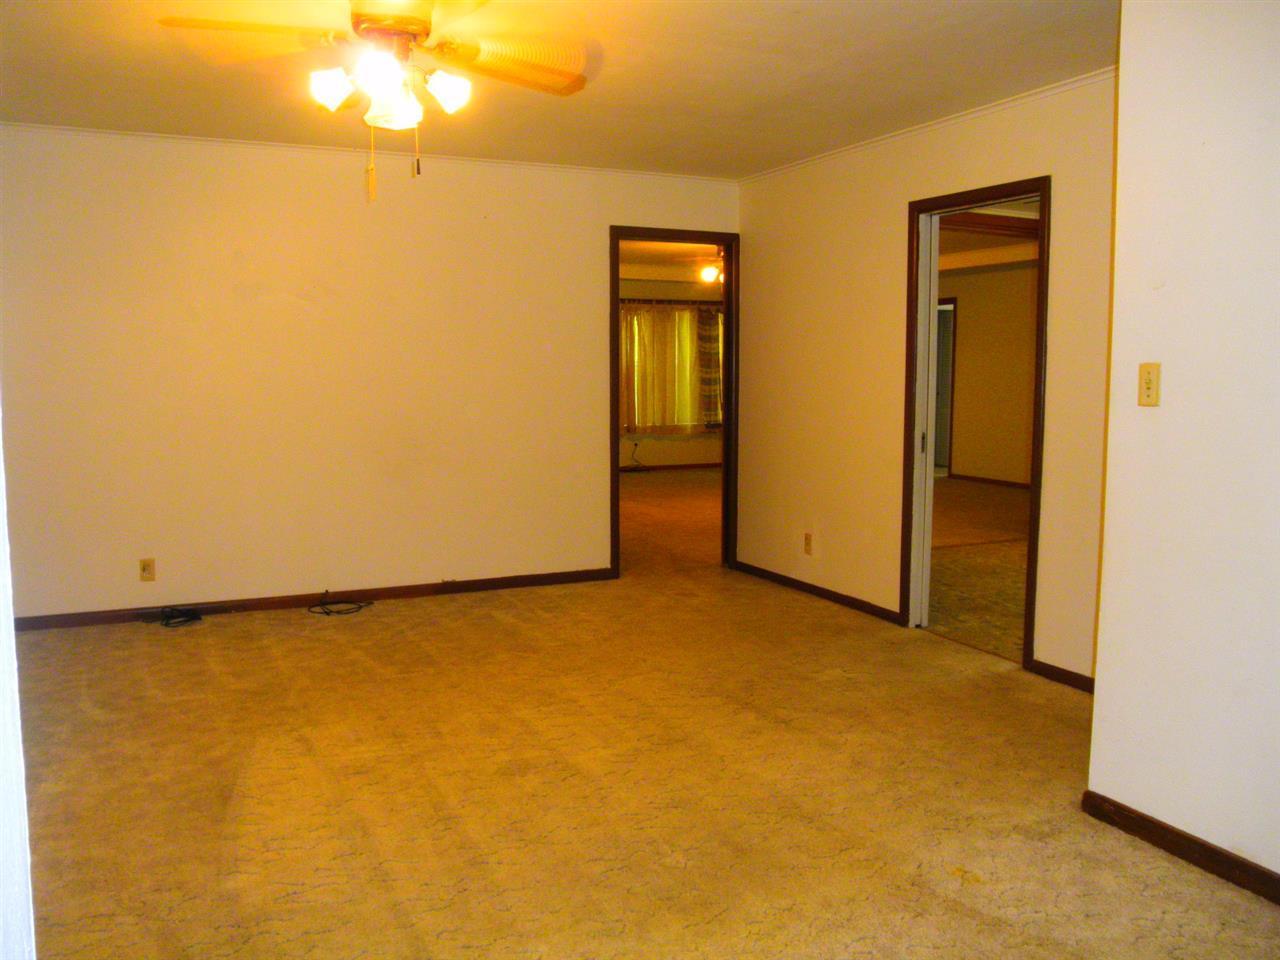 Sold Cross Sale W/ MLS | 1601 Blackard Ponca City, OK 74604 8